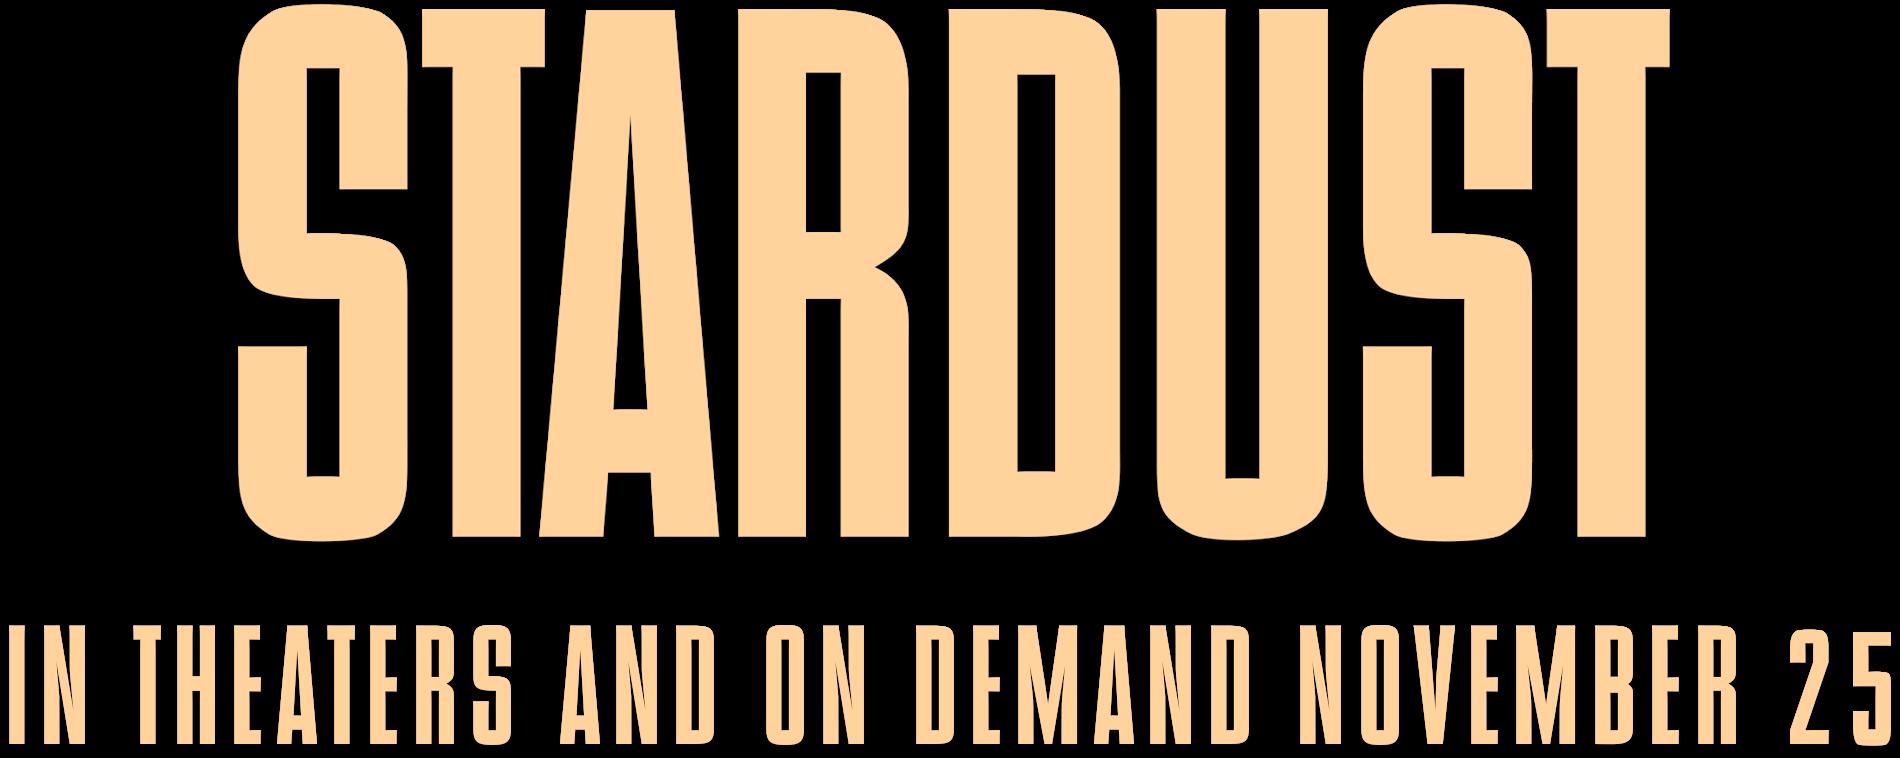 Stardust: Synopsis   IFC Films